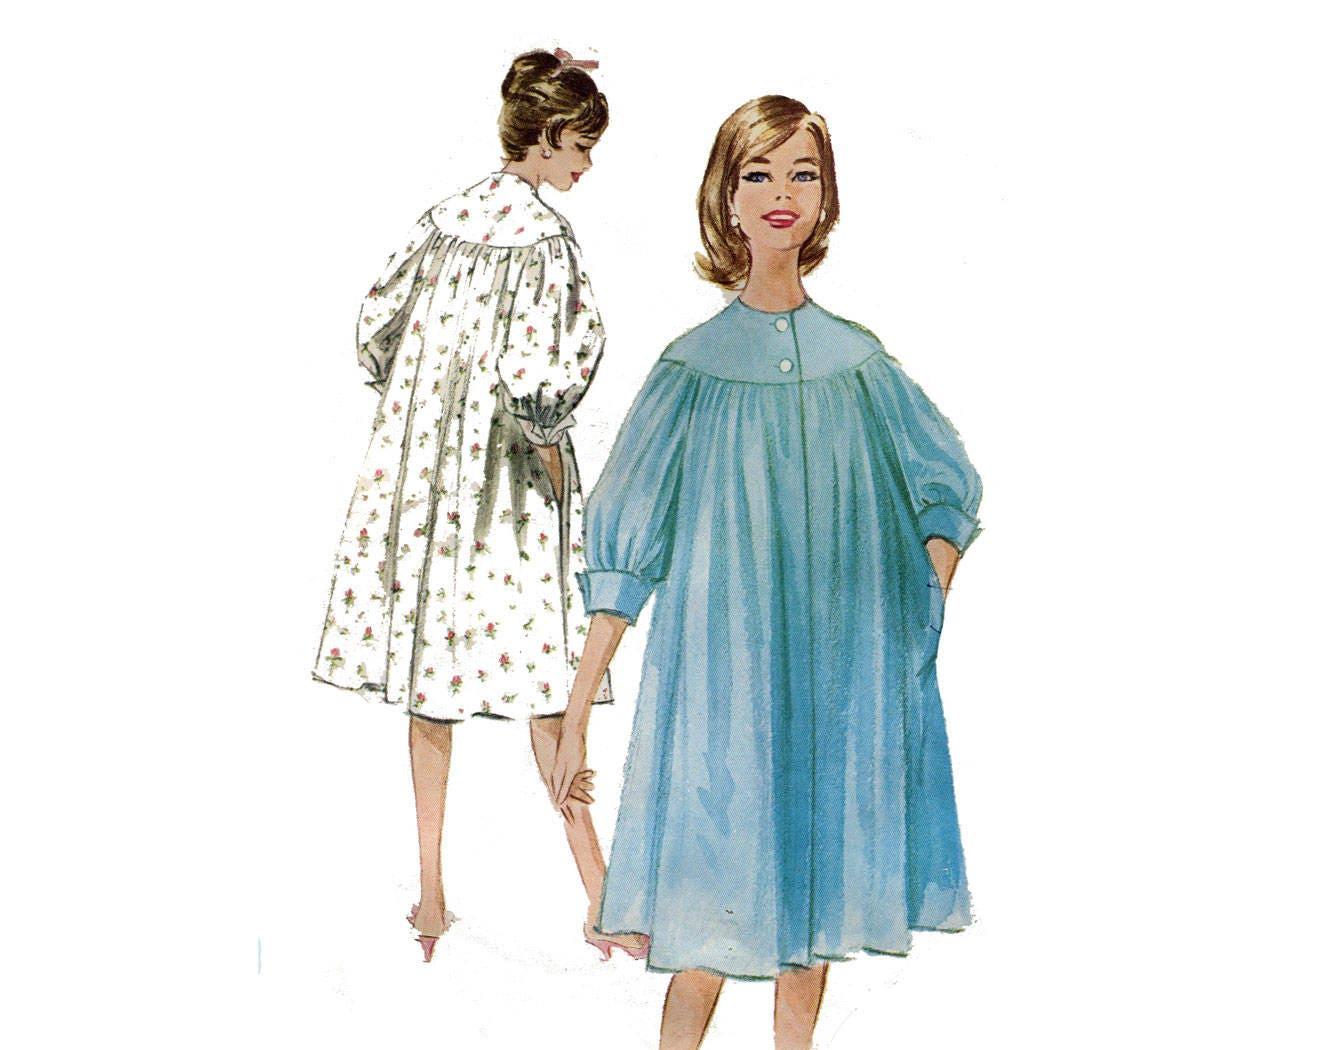 década de 1950 redondo yugo completo mangas tienda bata fácil patrón ...